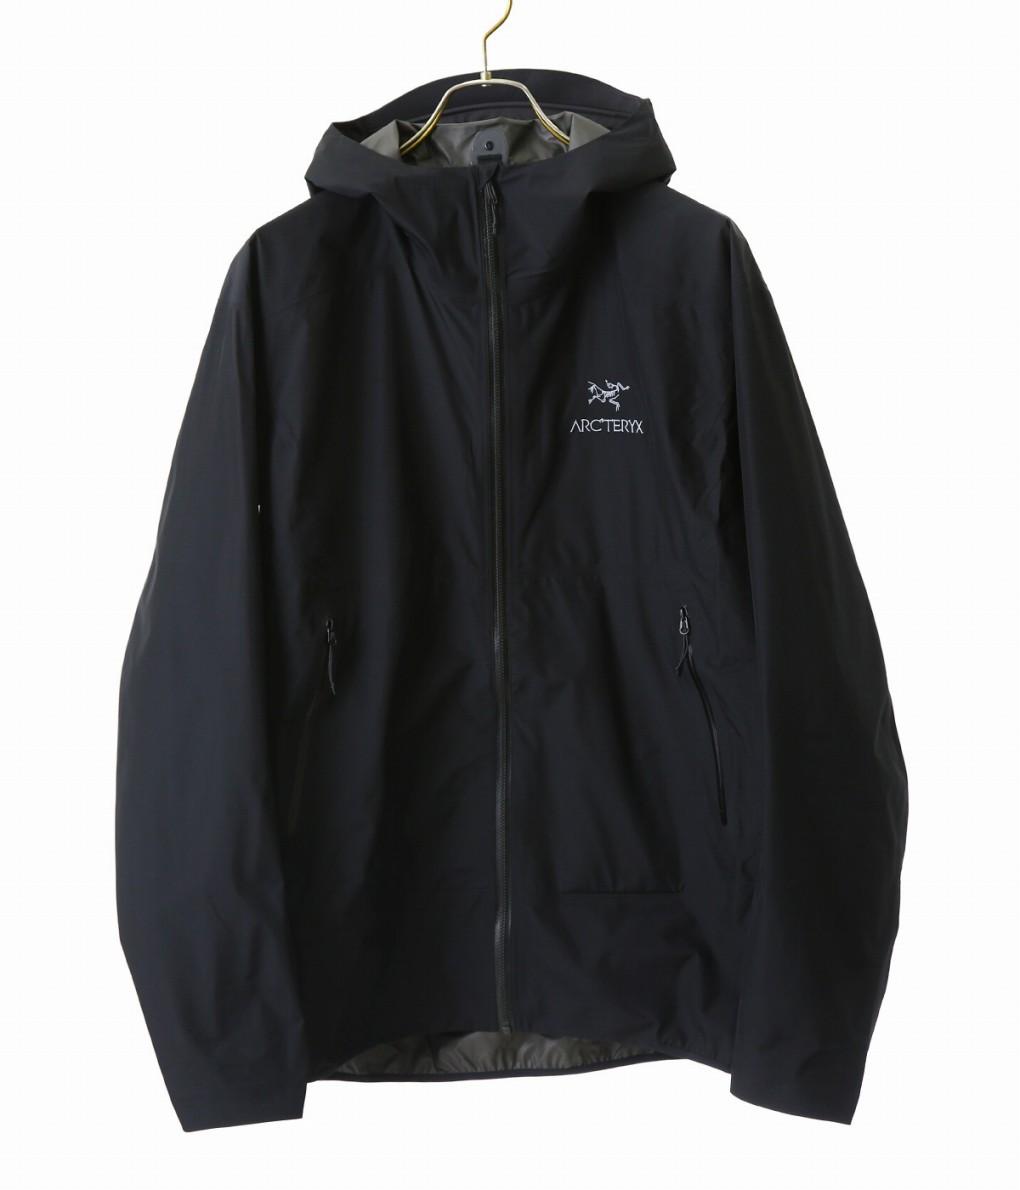 ARC'TERYX / アークテリクス : Zeta FL Jacket Men's : スポーツ アークテリクス ゼータ エフエル ジャケット メンズ : L07130800 【STD】【REA】